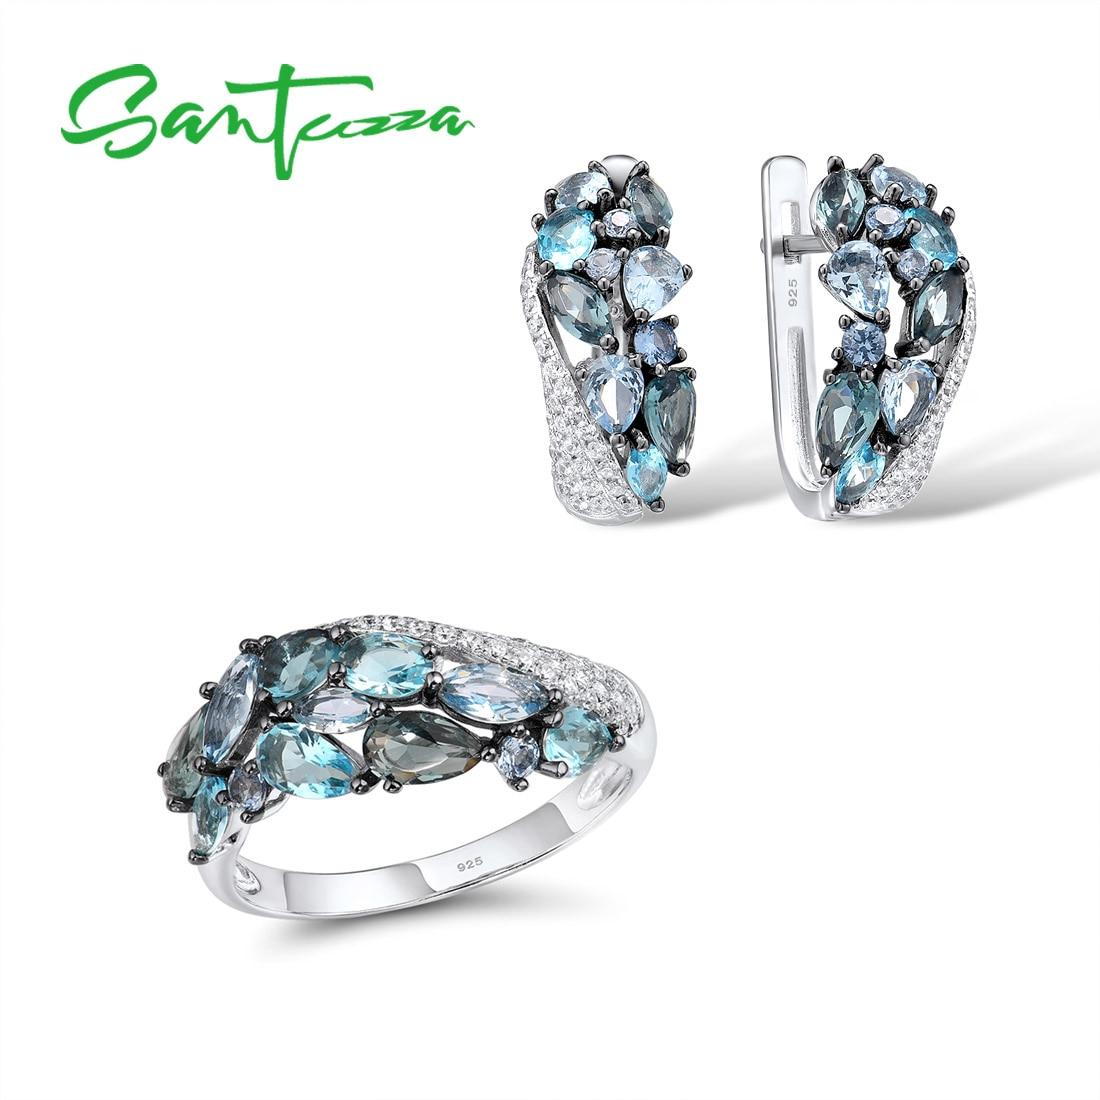 SANTUZZA Genuine 925 Silver Jewelry Set For Women Sparkling Blue Stone Earrings Ring Set Delicate Luxury Party Fine Jewelry